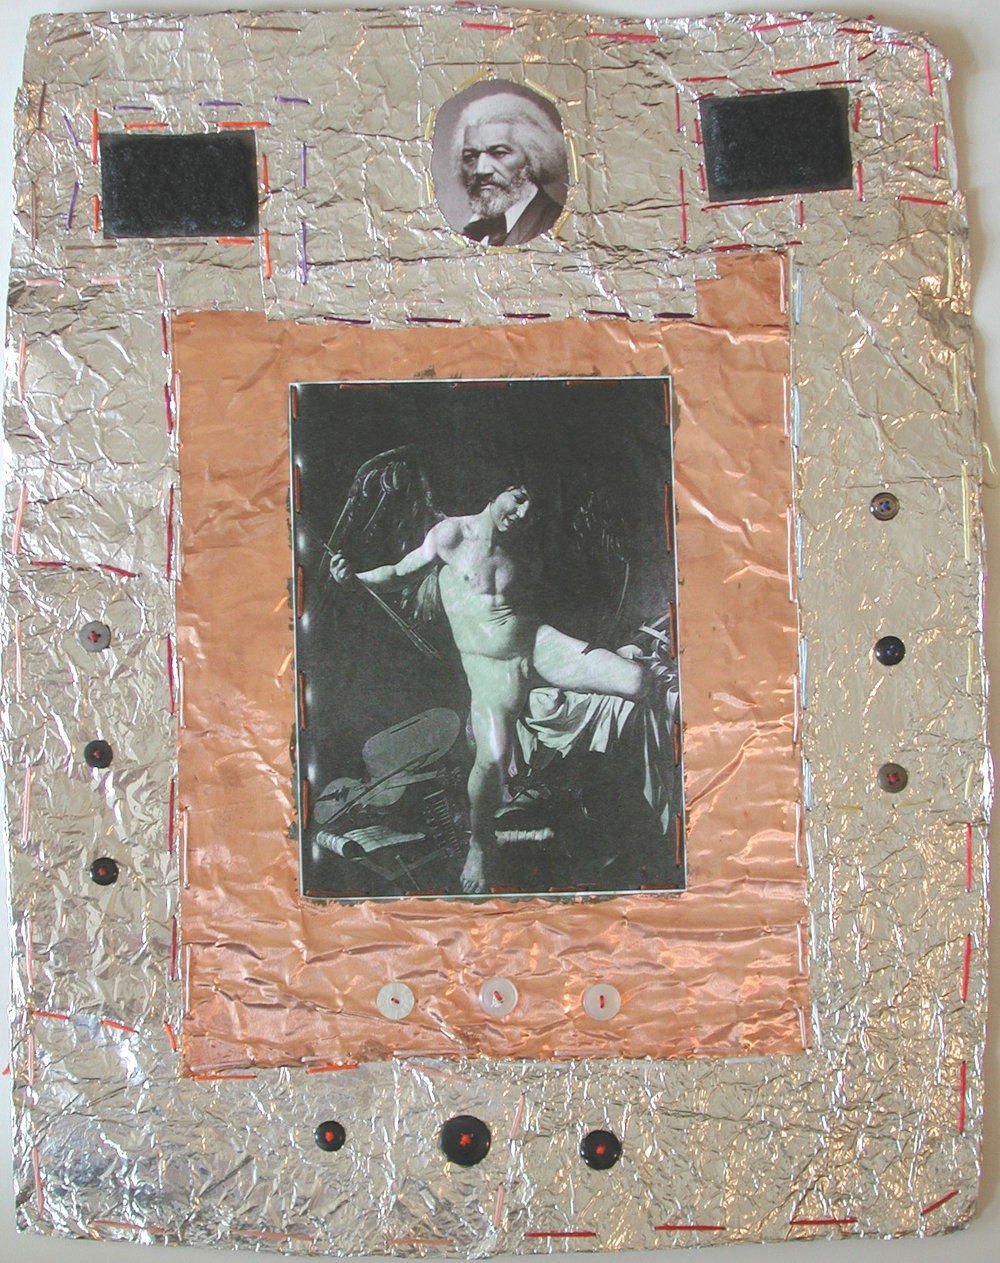 1. Frederick Douglas, Caravaggio, Black History #3.jpg